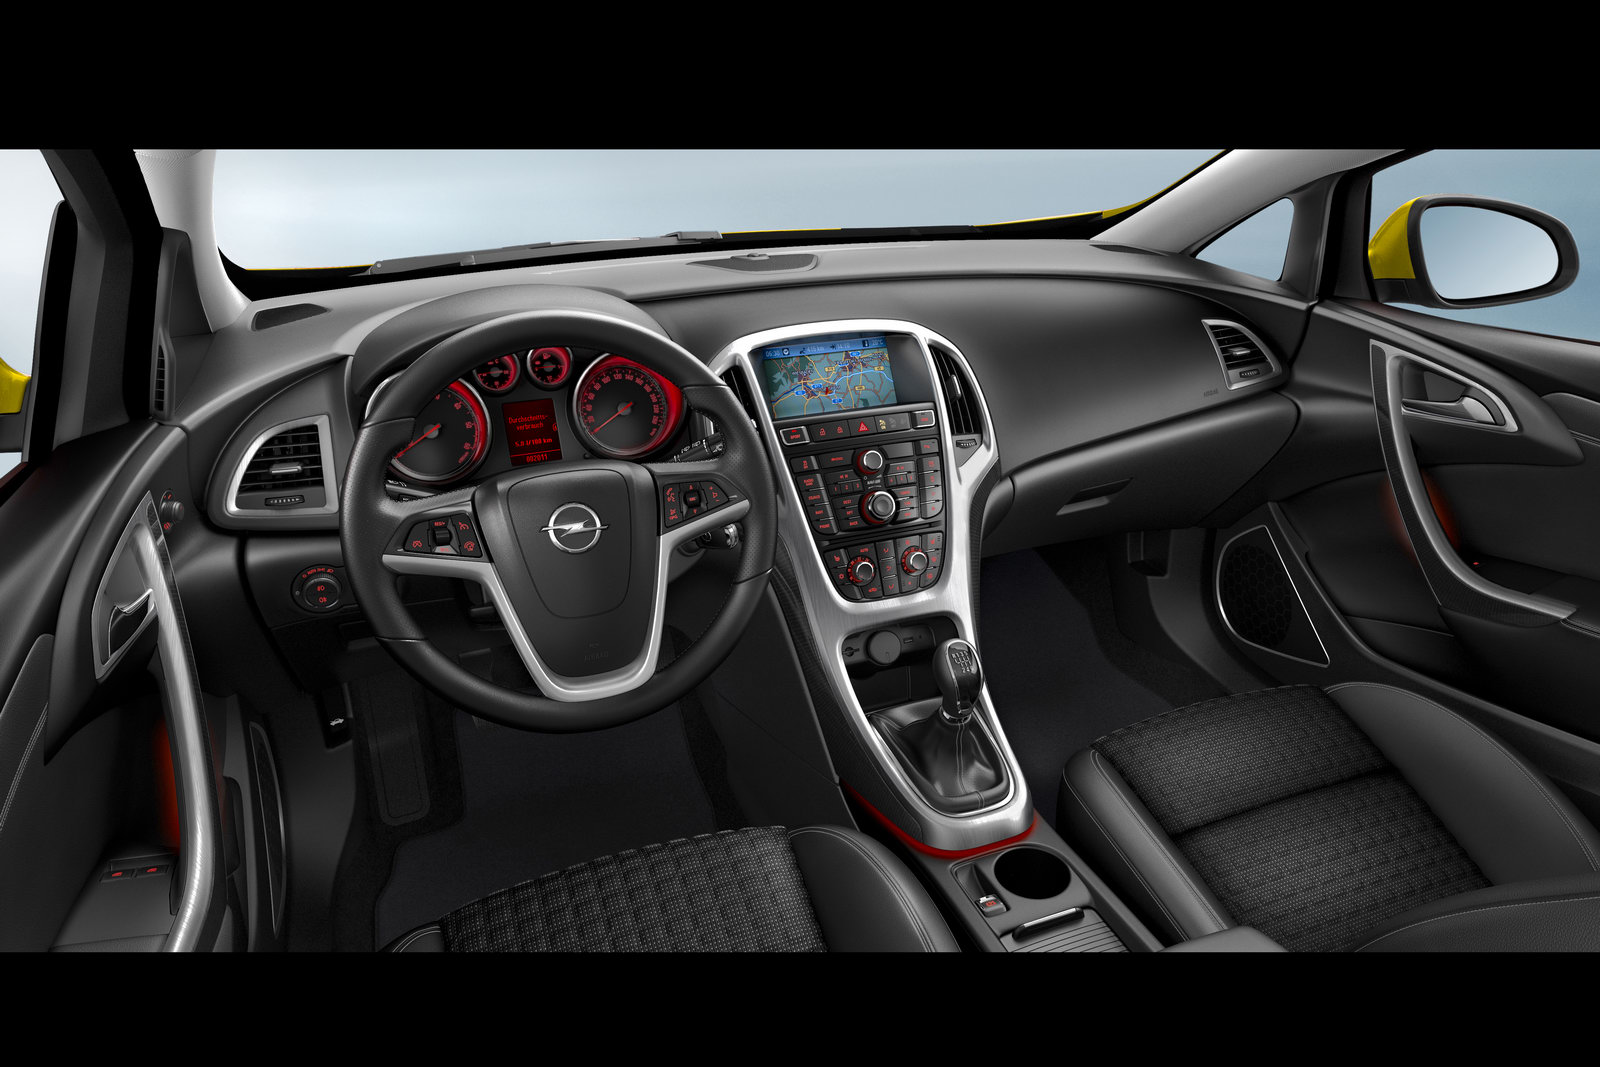 Opel Astra Gtc 2012 15 32